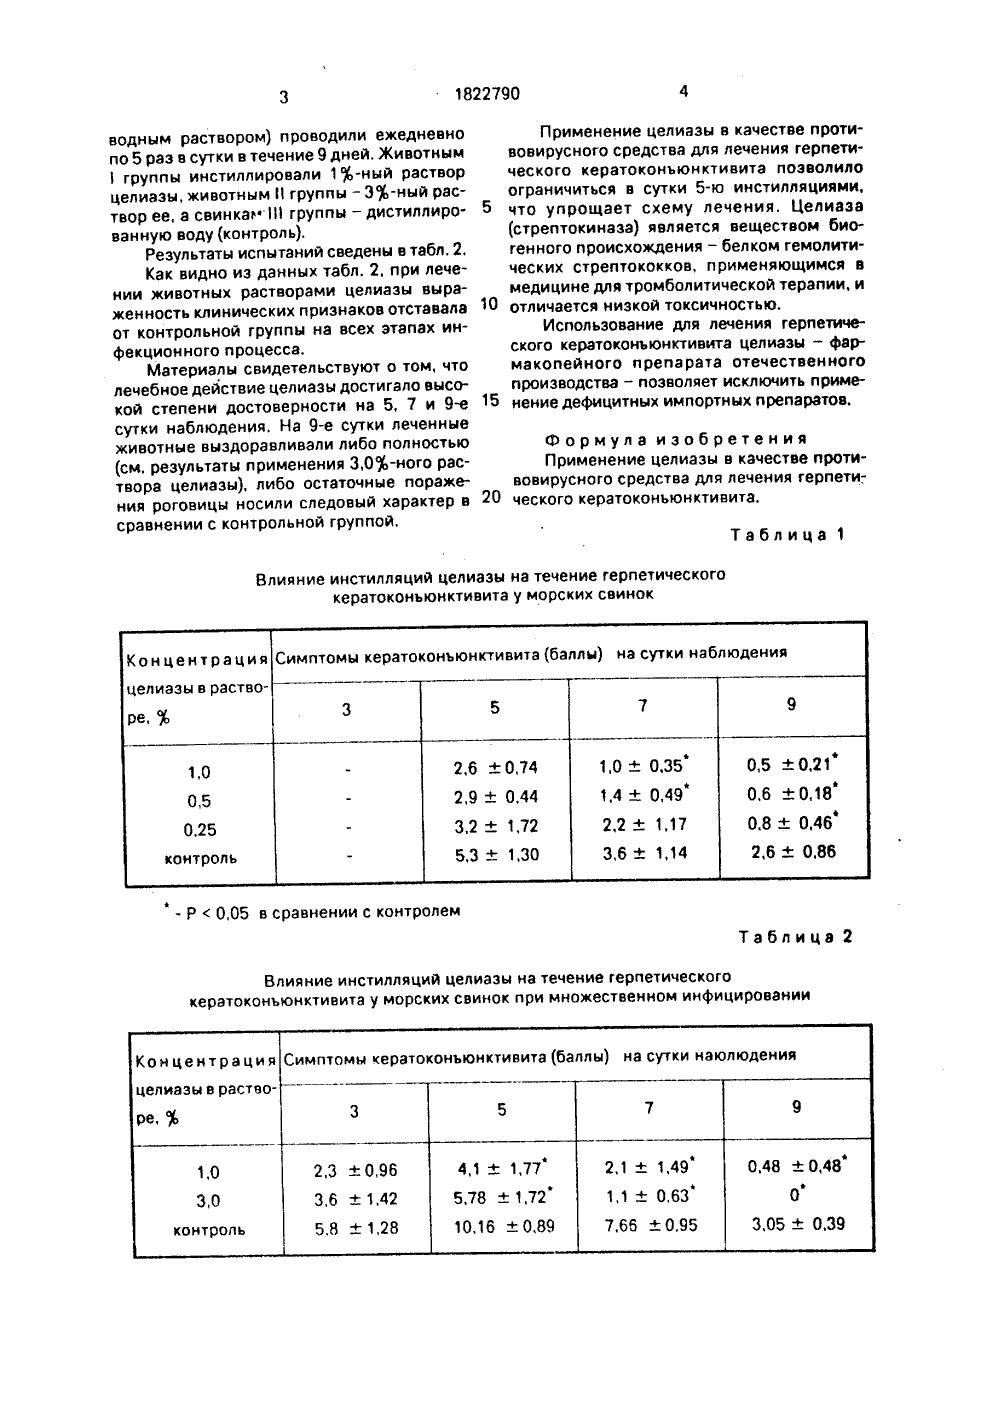 курс лечения вирусного кератоконъюнктивита